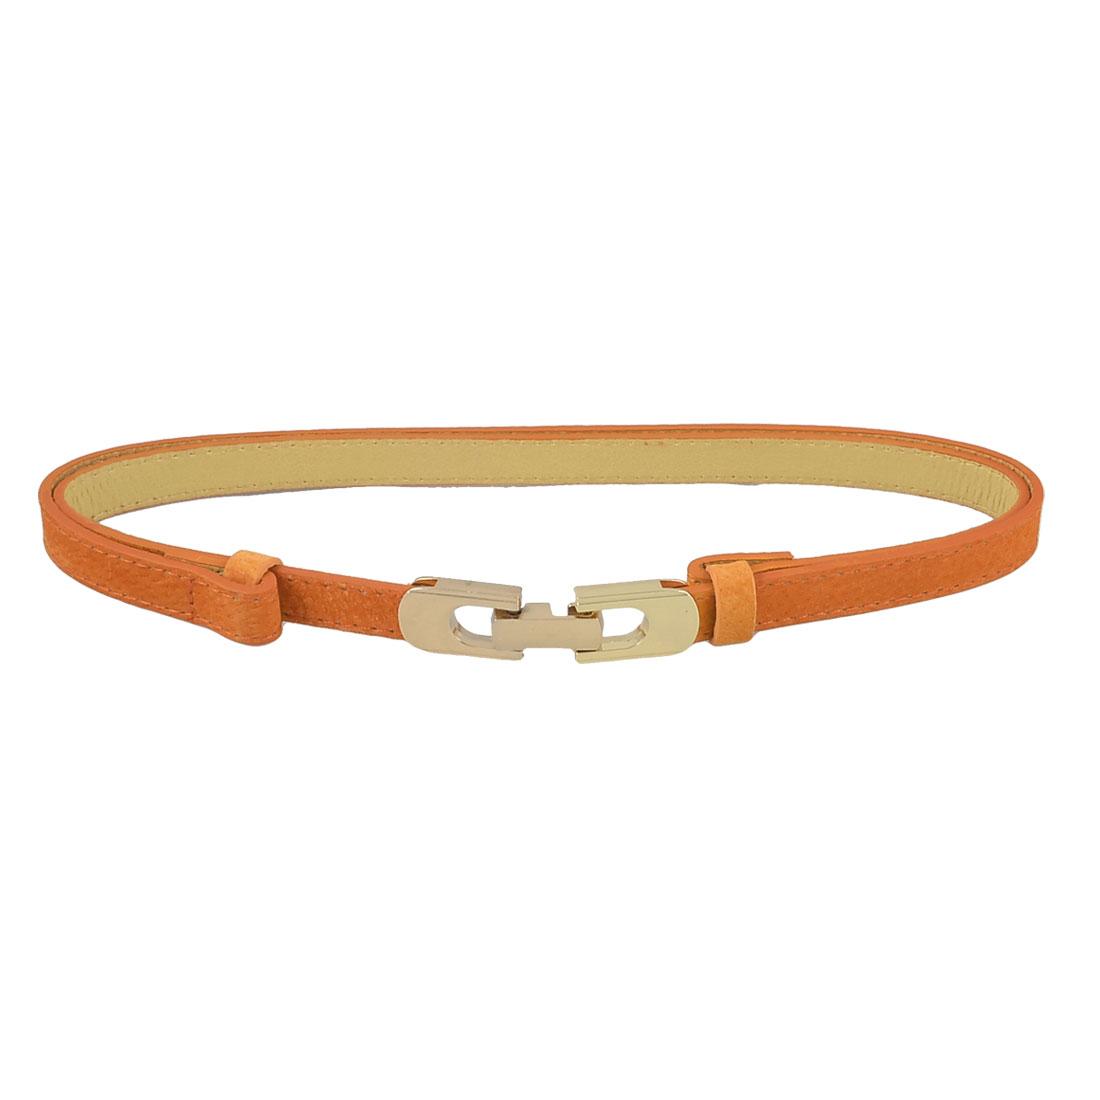 "Orange Gold Tone Interlocking Buckle Adjustable Waist Belt 0.6"" Width for Lady"